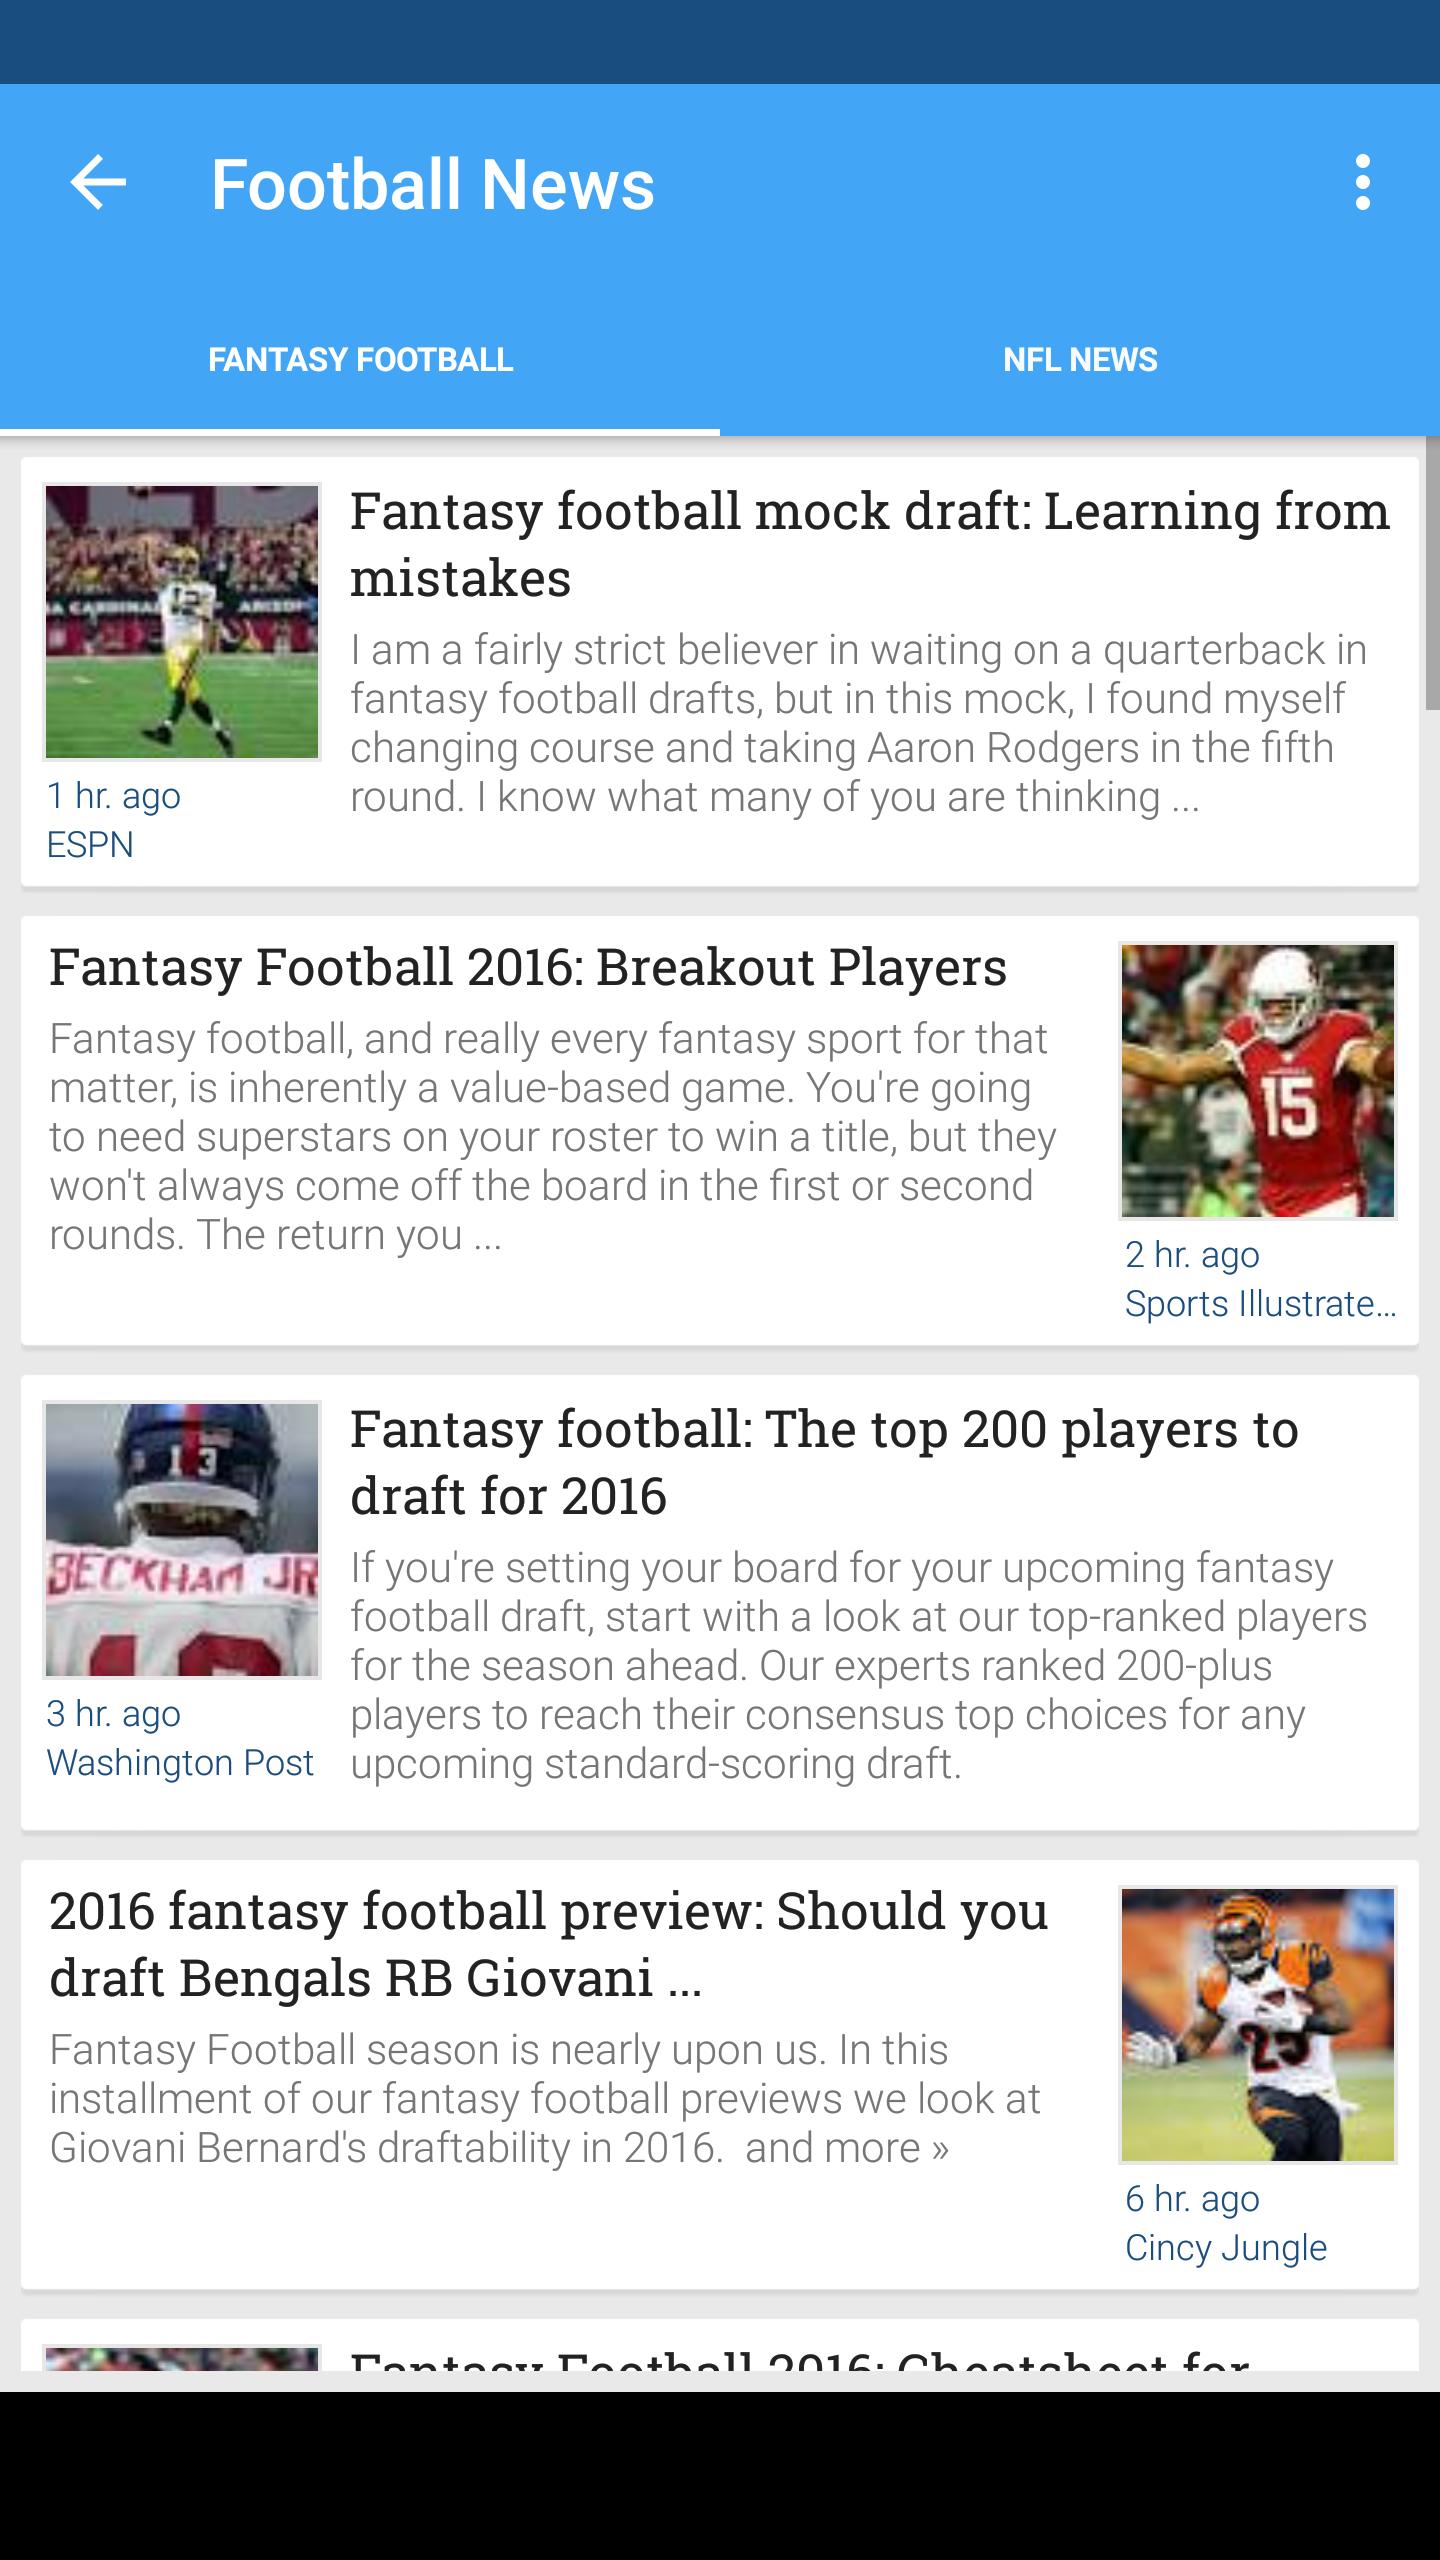 6 apps to establish total dominance this Fantasy Football season